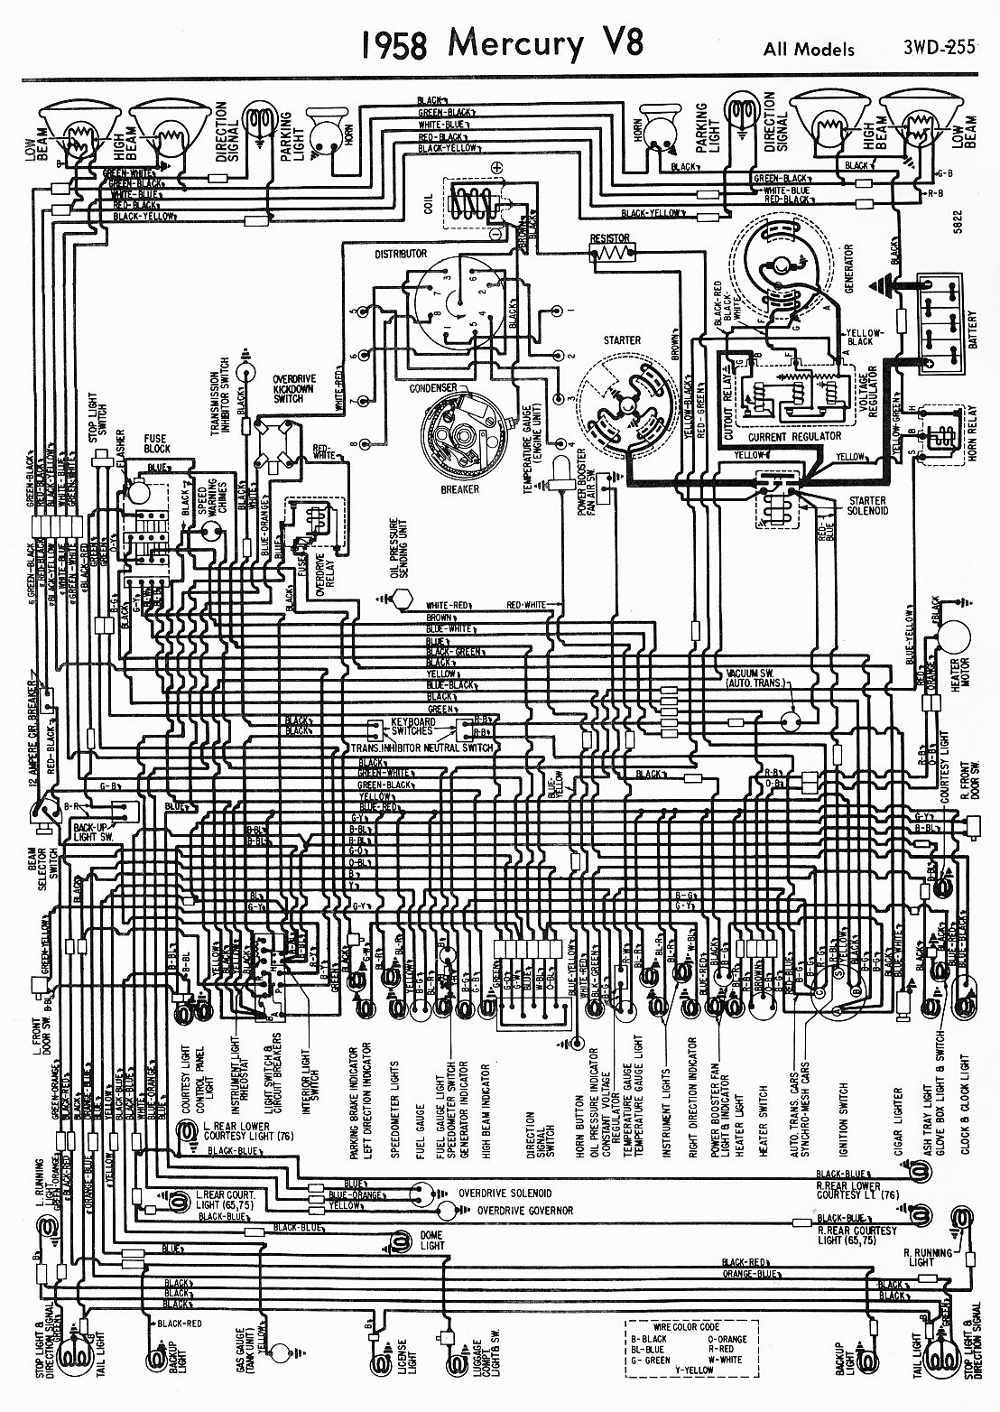 Wiring Diagrams 911 Mercury V8 All Models Wiring Diagram